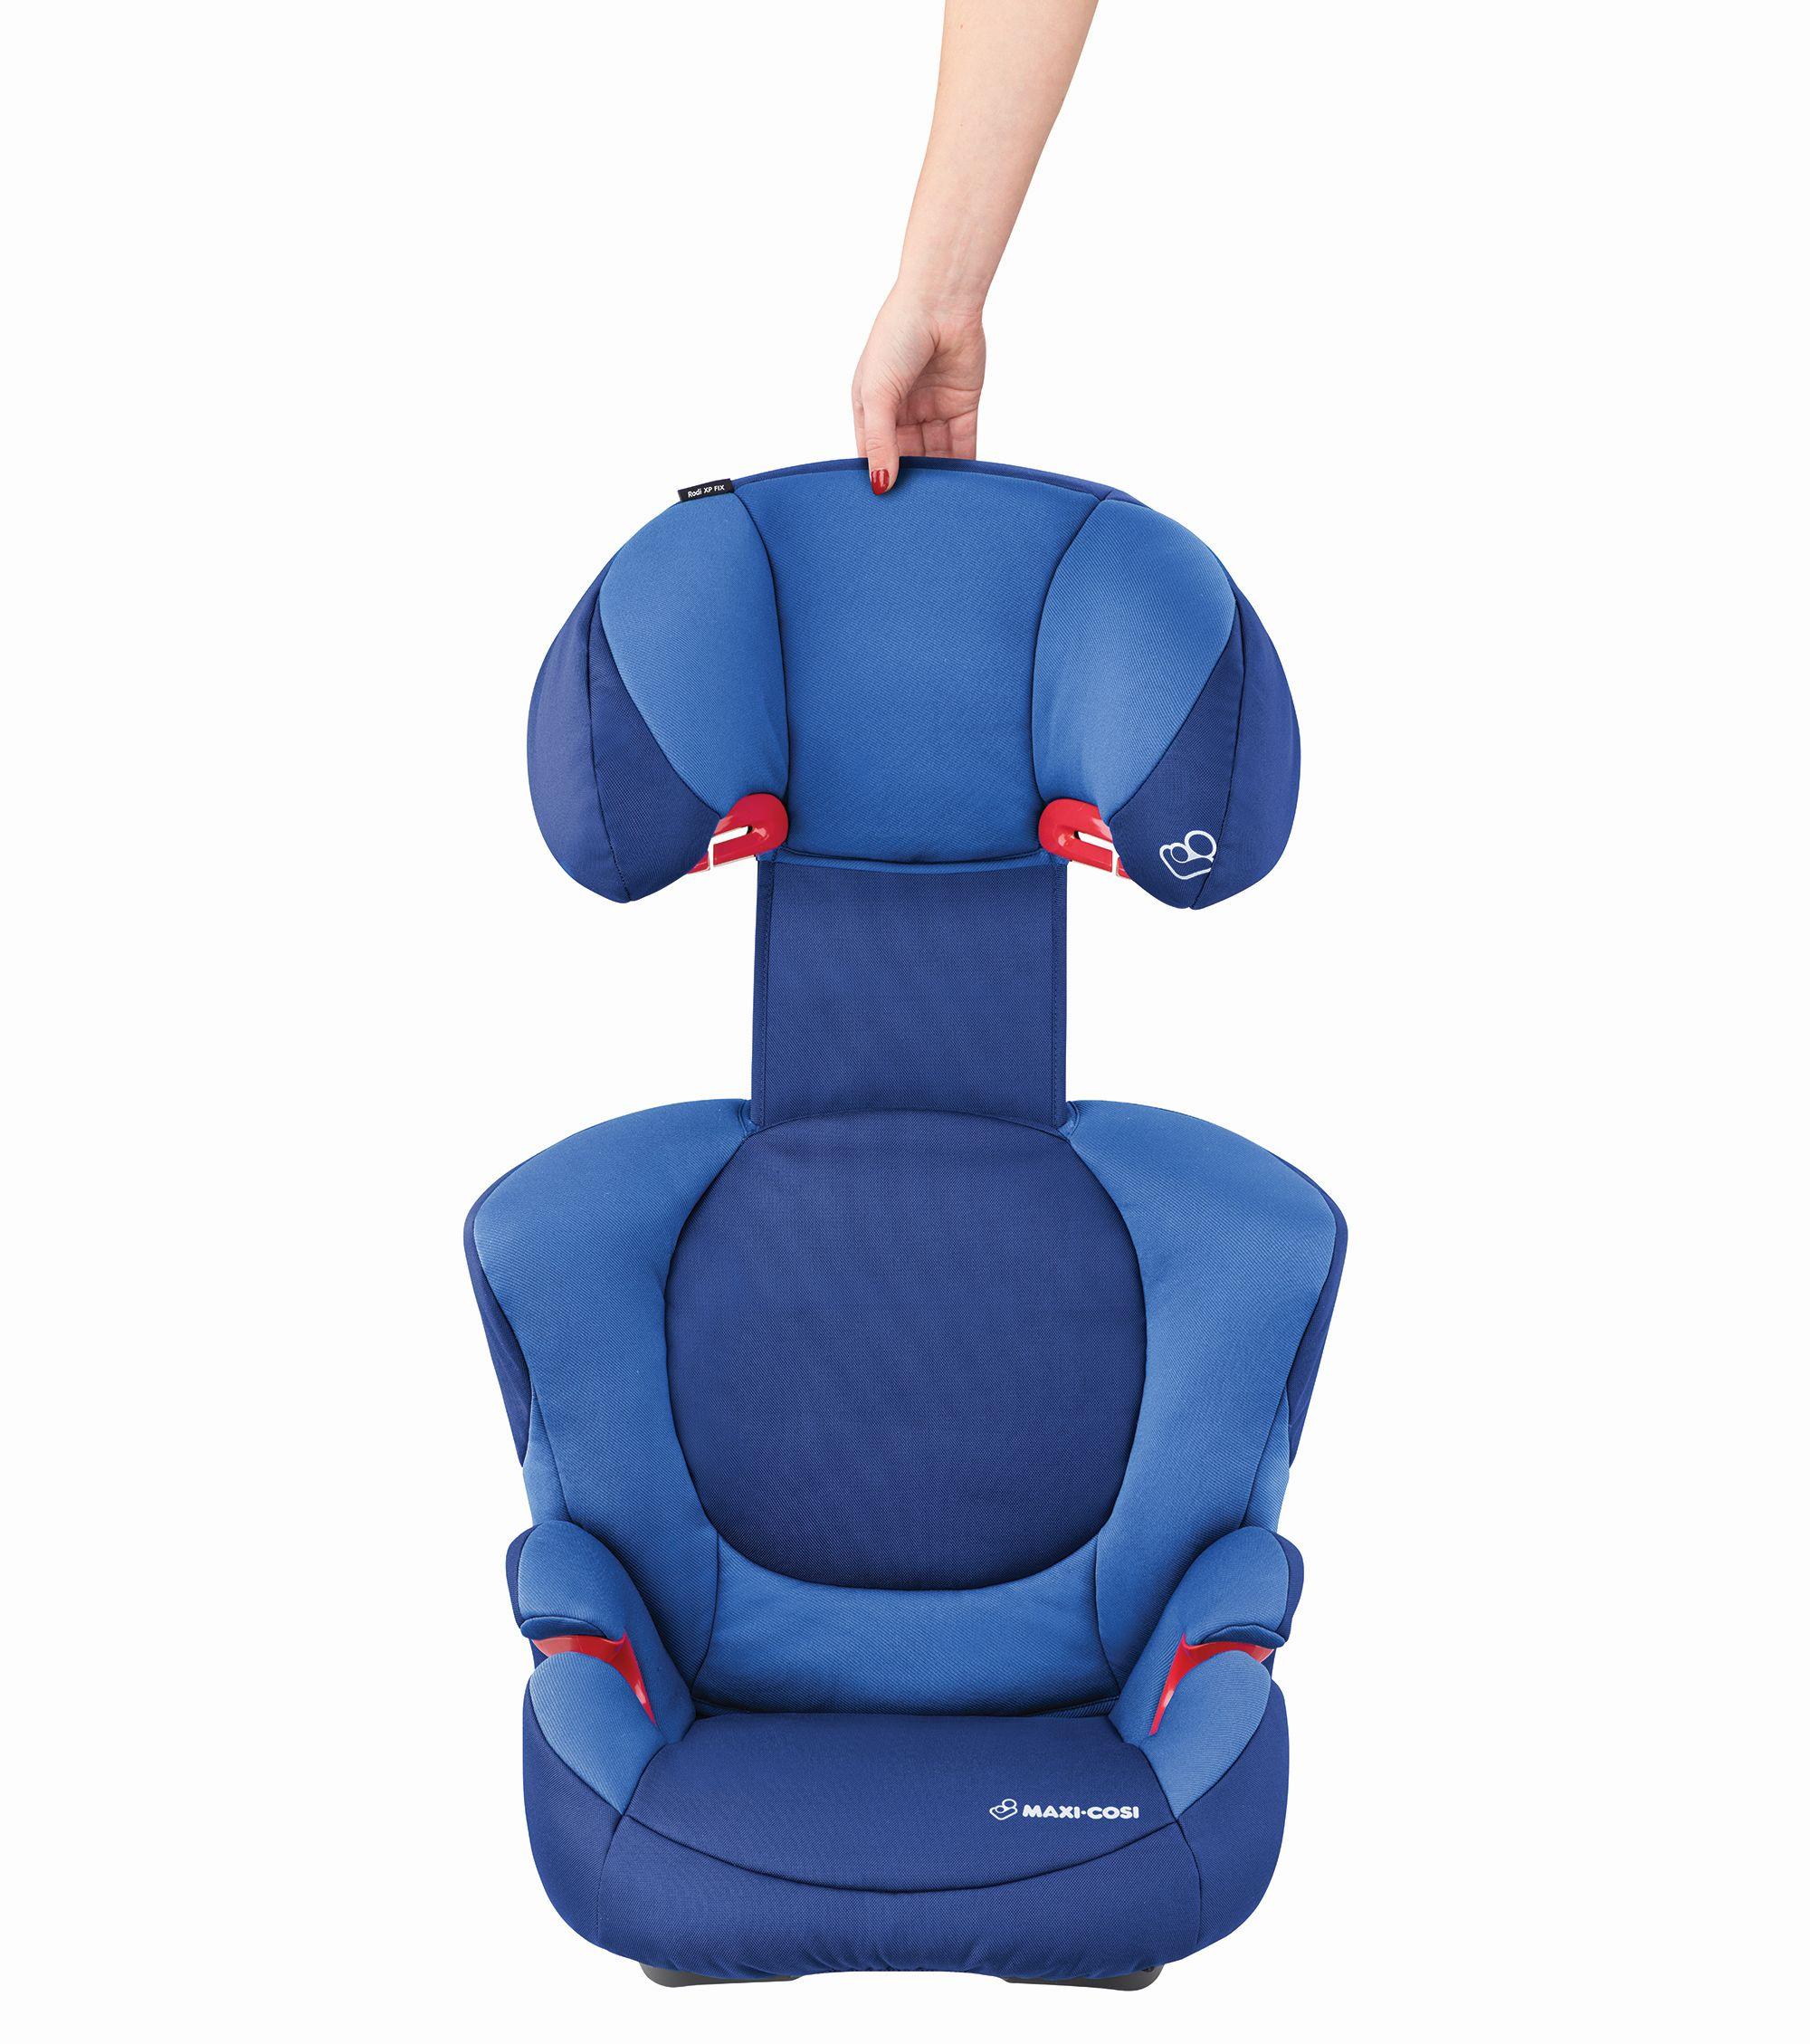 maxi cosi child car seat rodi xp fix 2019 electric blue. Black Bedroom Furniture Sets. Home Design Ideas